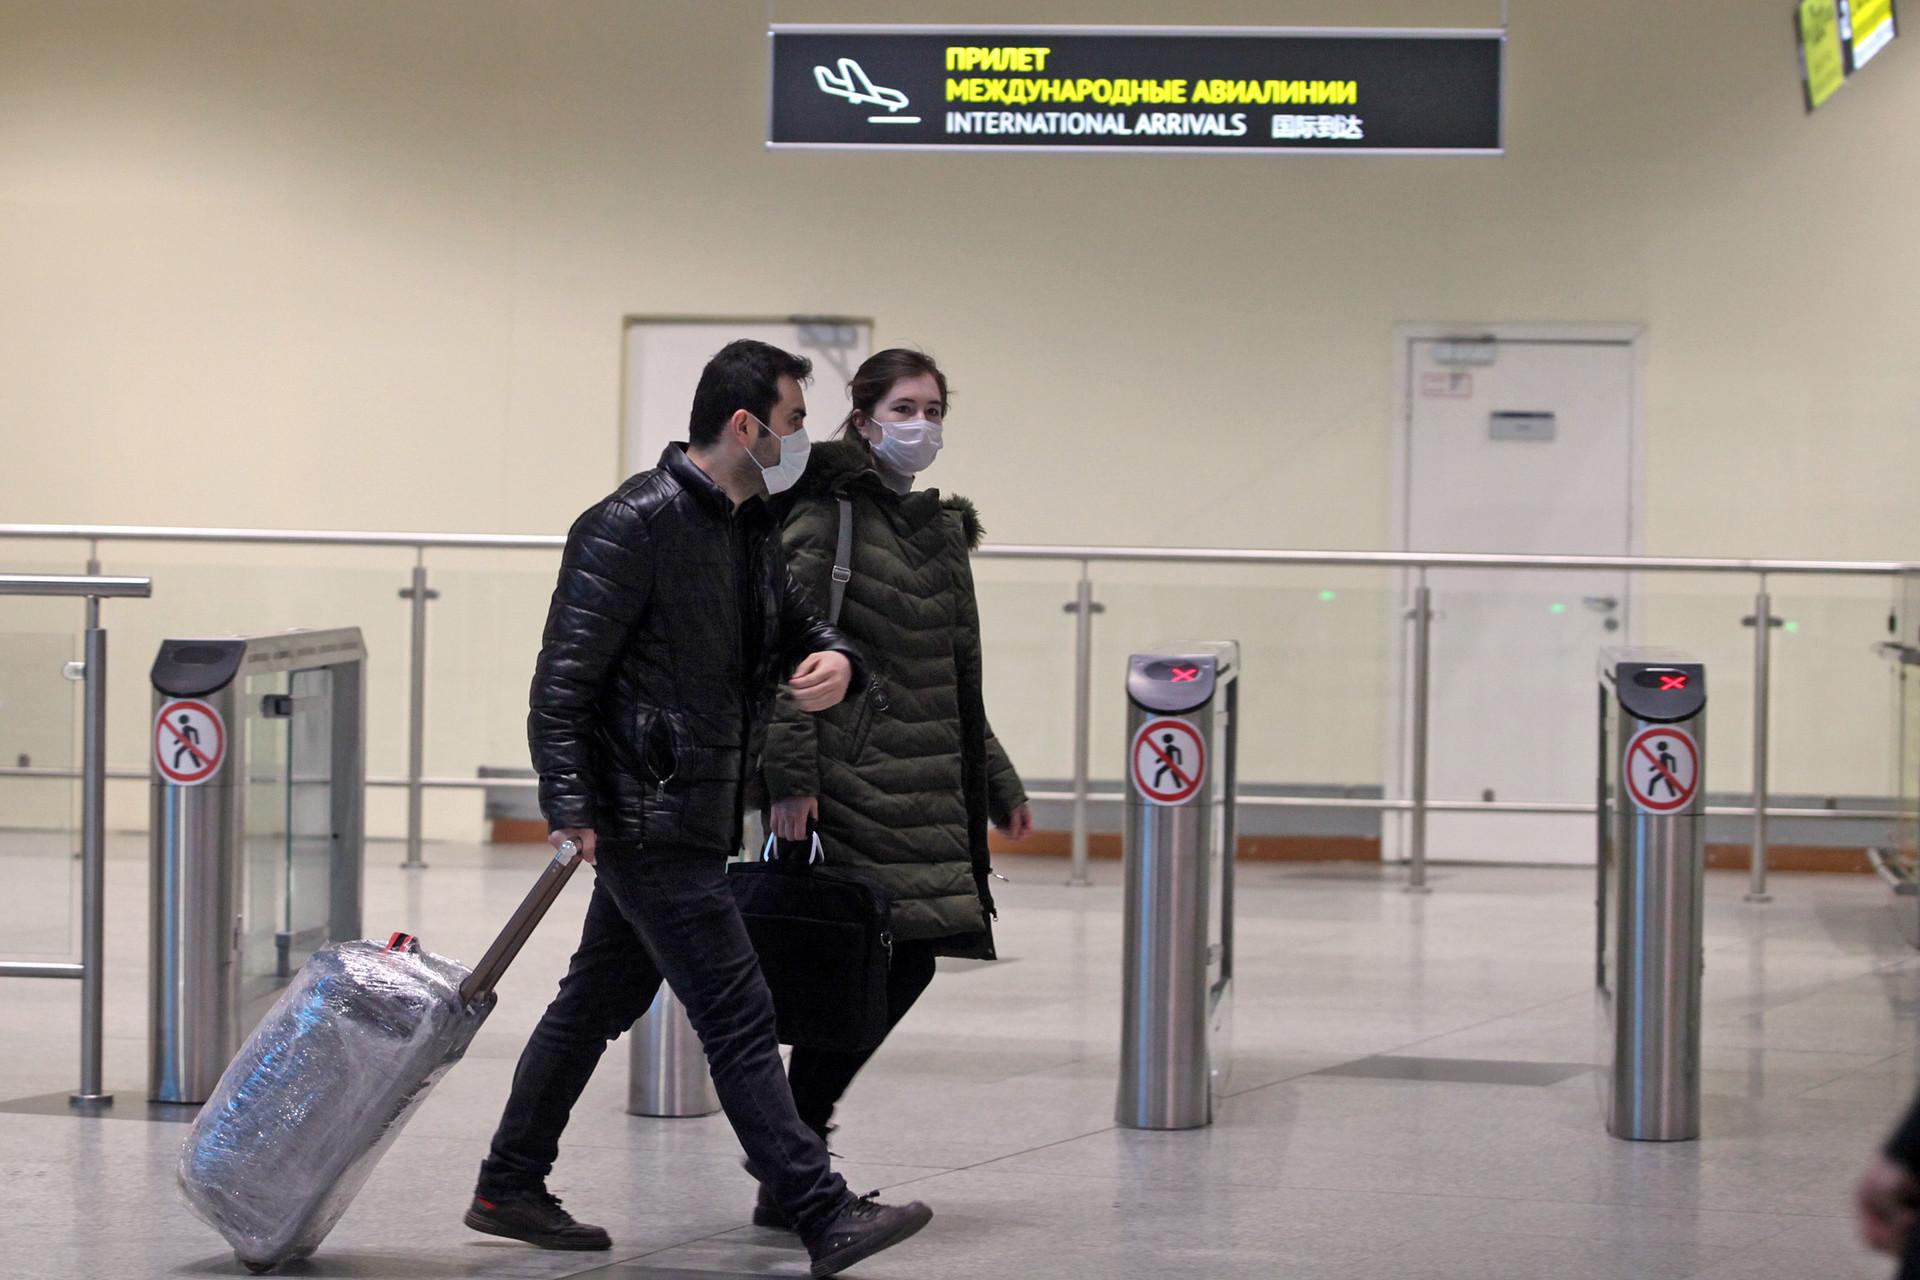 Dua penumpang melintas di dekat pintu kedatangan internasional pada hari pertama pemberlakuan pembatasan masuk warga asing di Bandara Internasional Domodedovo, Moskow, Rabu (18/3).